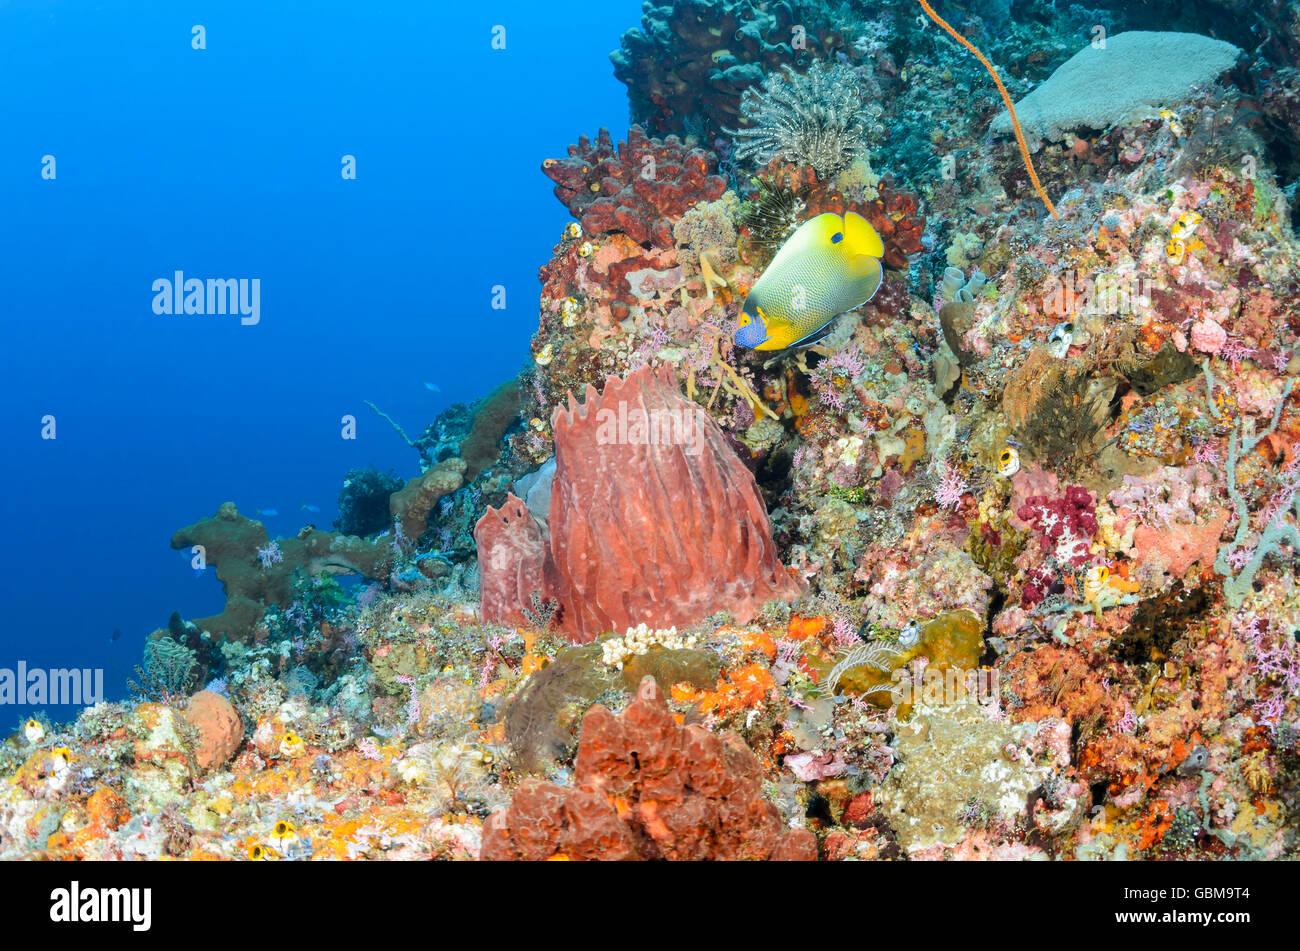 coral reef scene with Yellow-Mask angelfish, Pomacanthus xanthometopon, Ambon, Maluku, Indonesia, Pacific - Stock Image